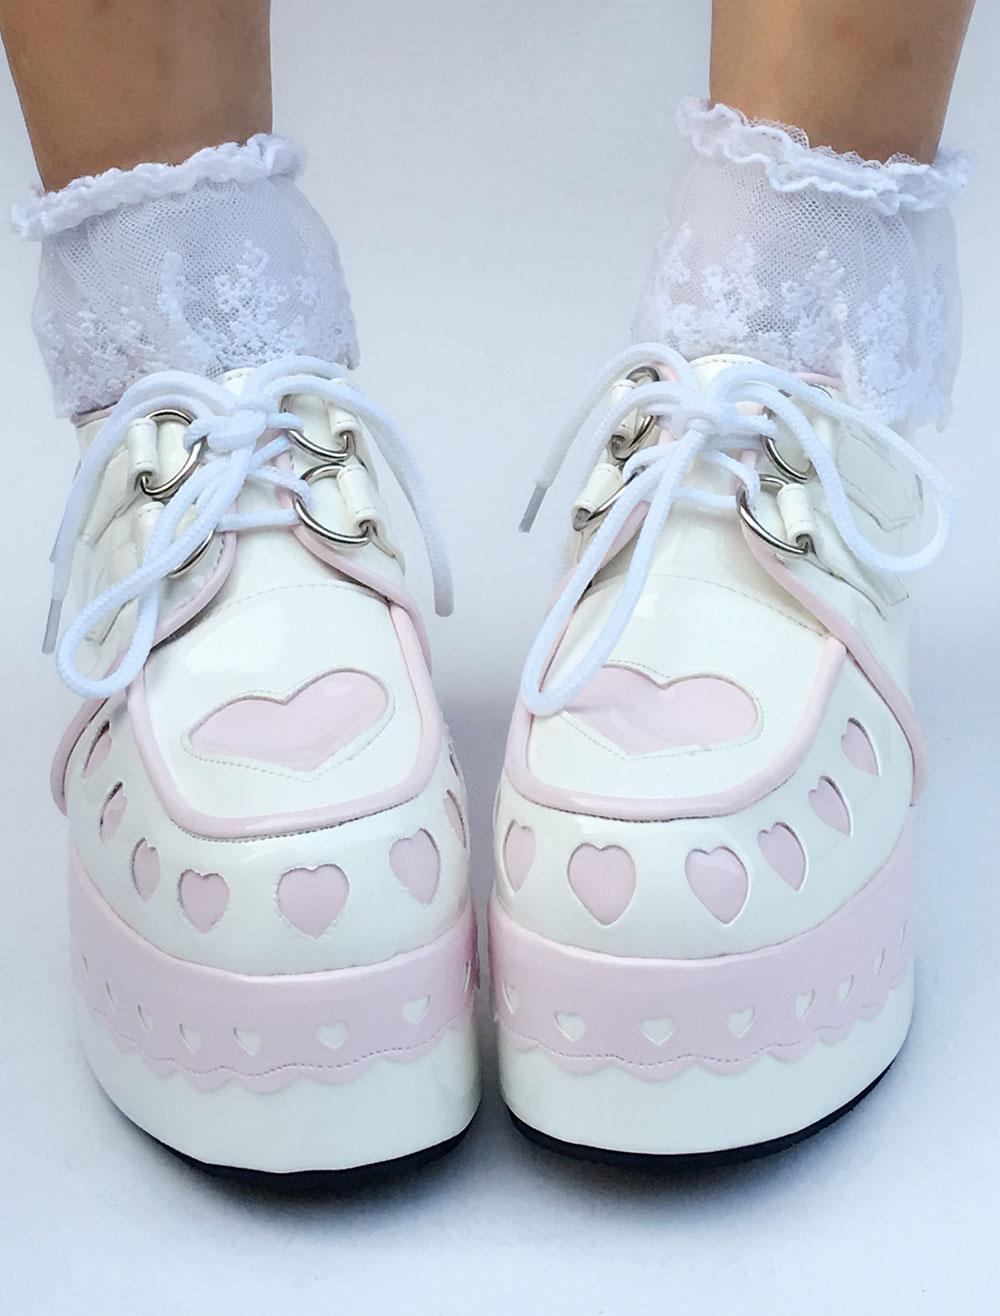 Lolitashow Sweet Lolita Shoes Platform